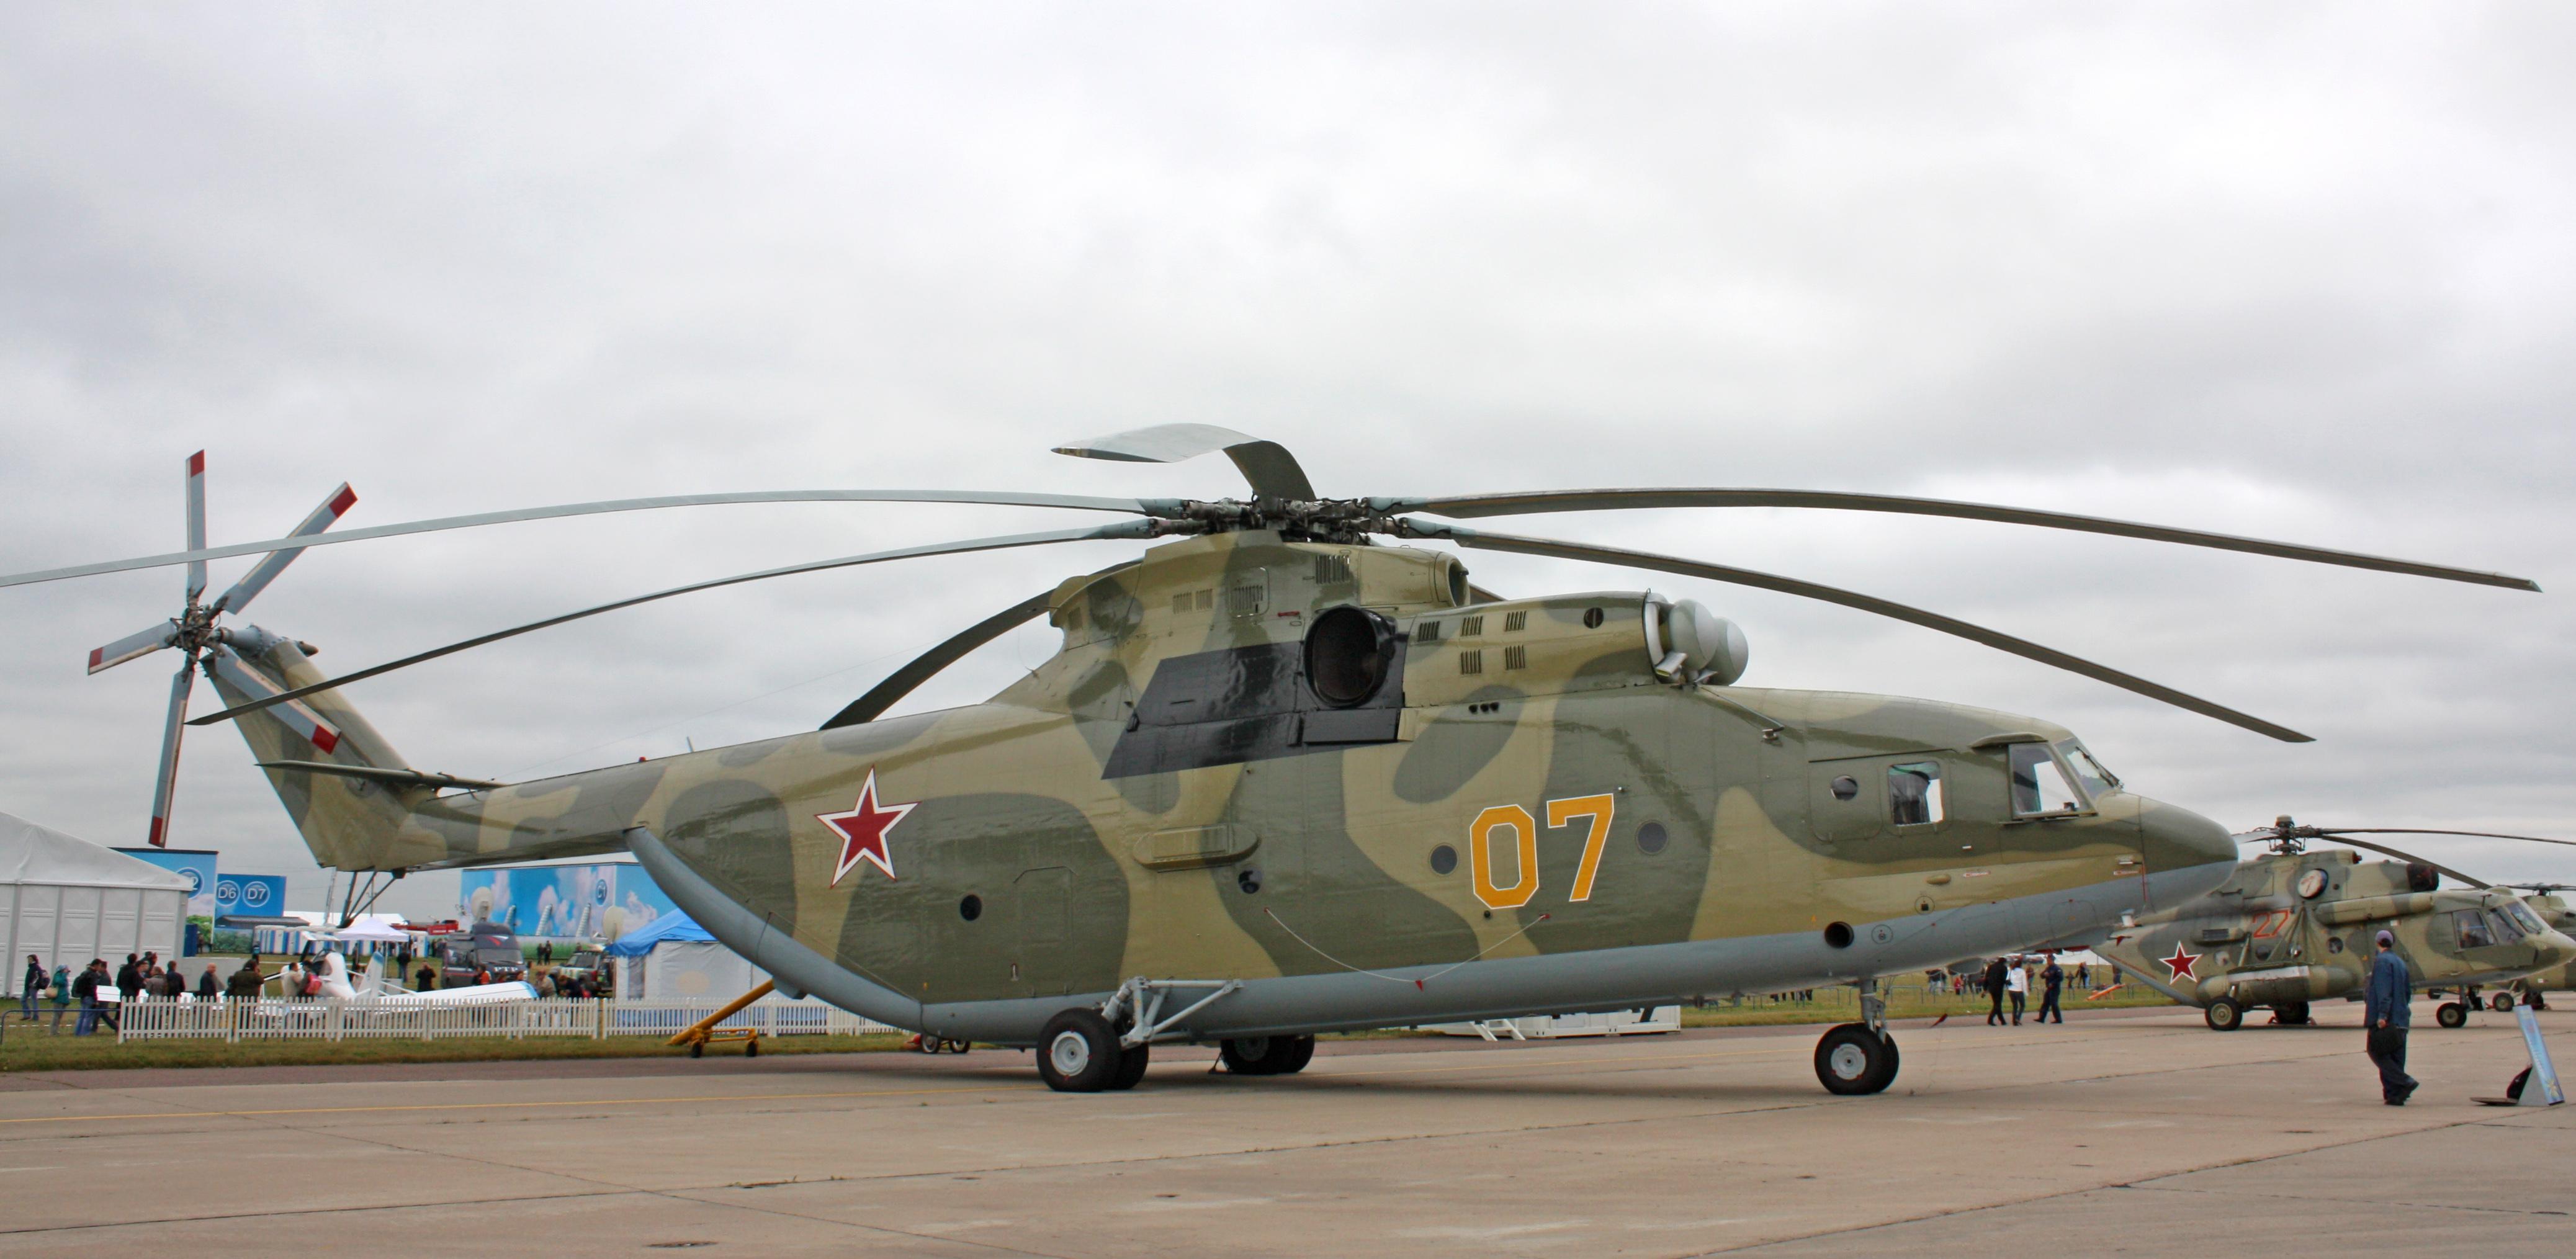 Обои Mexican Air Force, ВВС Мексики, mi-26, Ми-26. Авиация foto 12